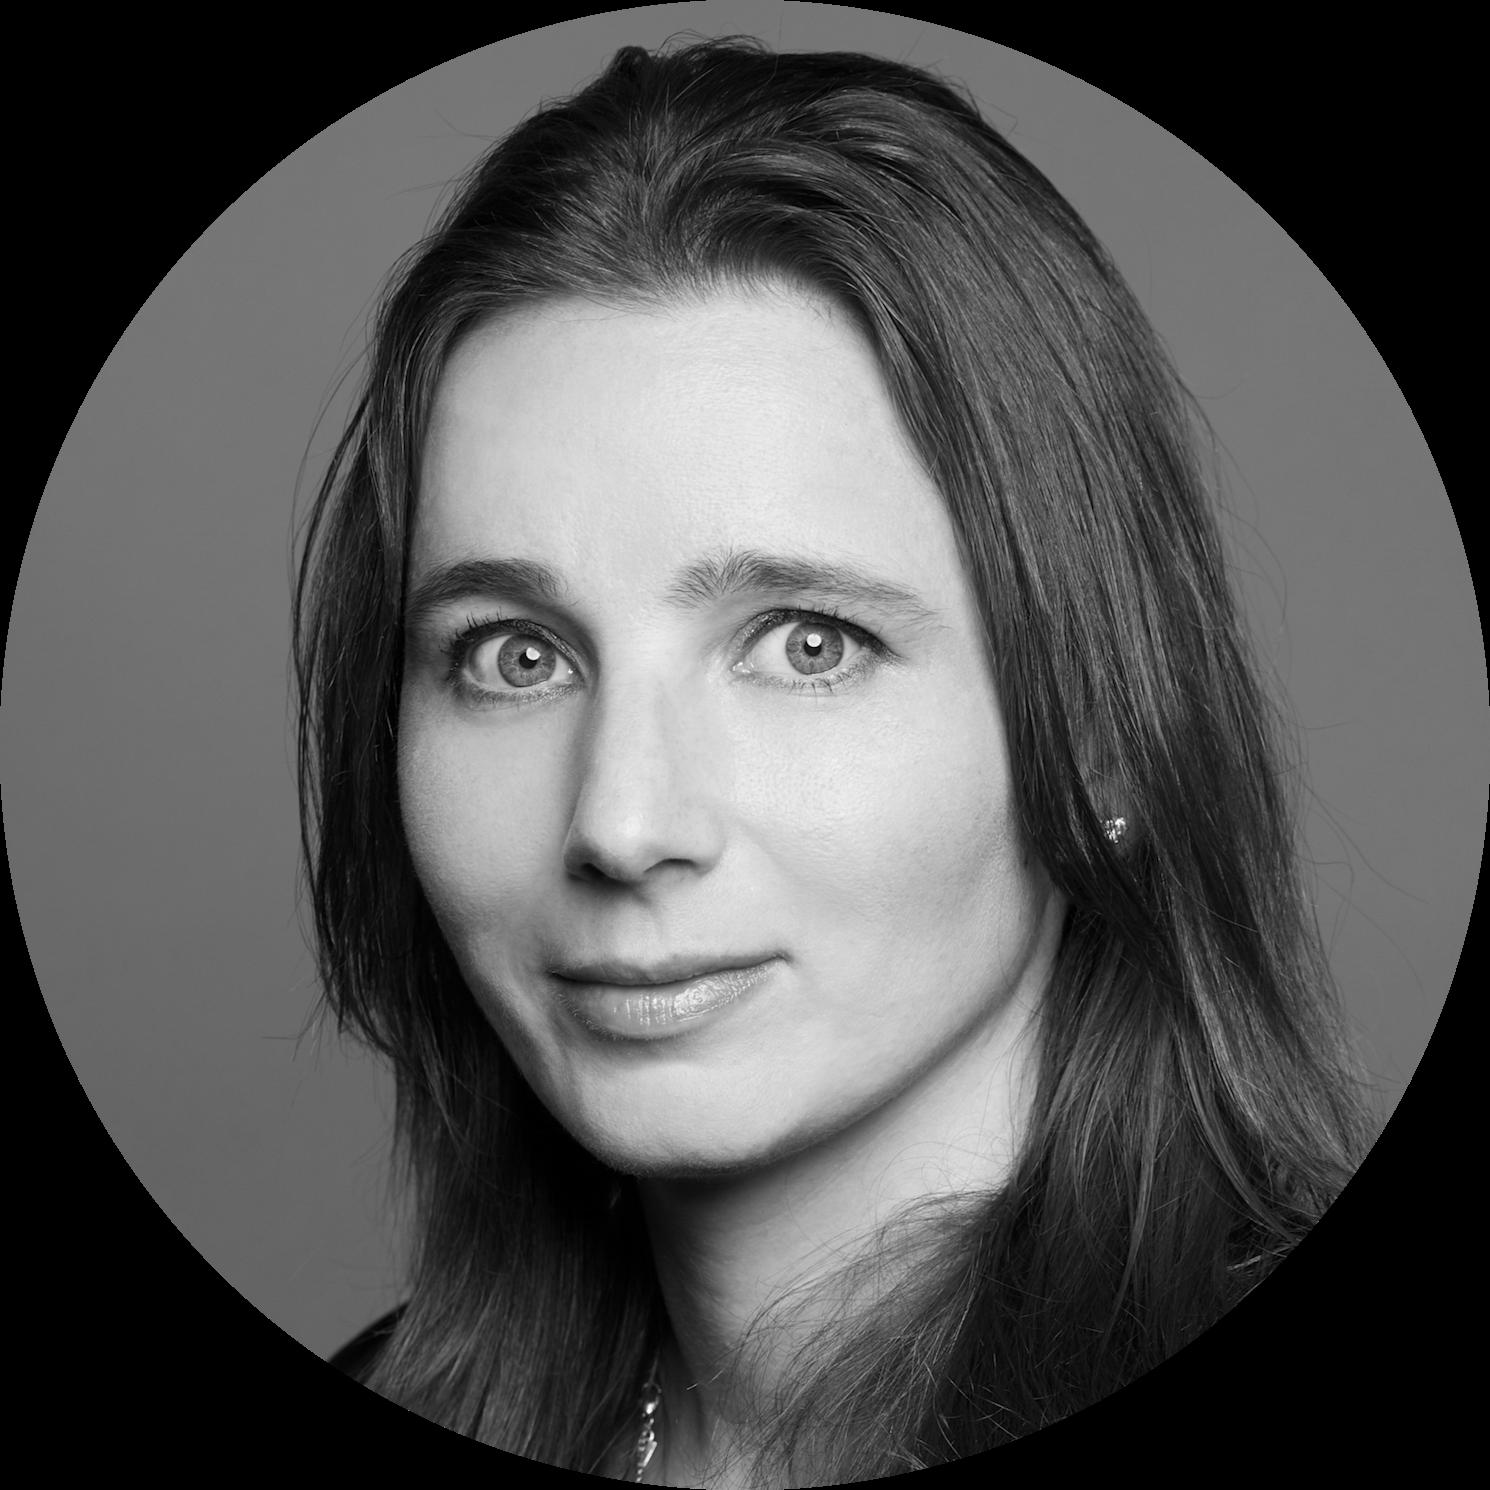 Claudia van der Salm